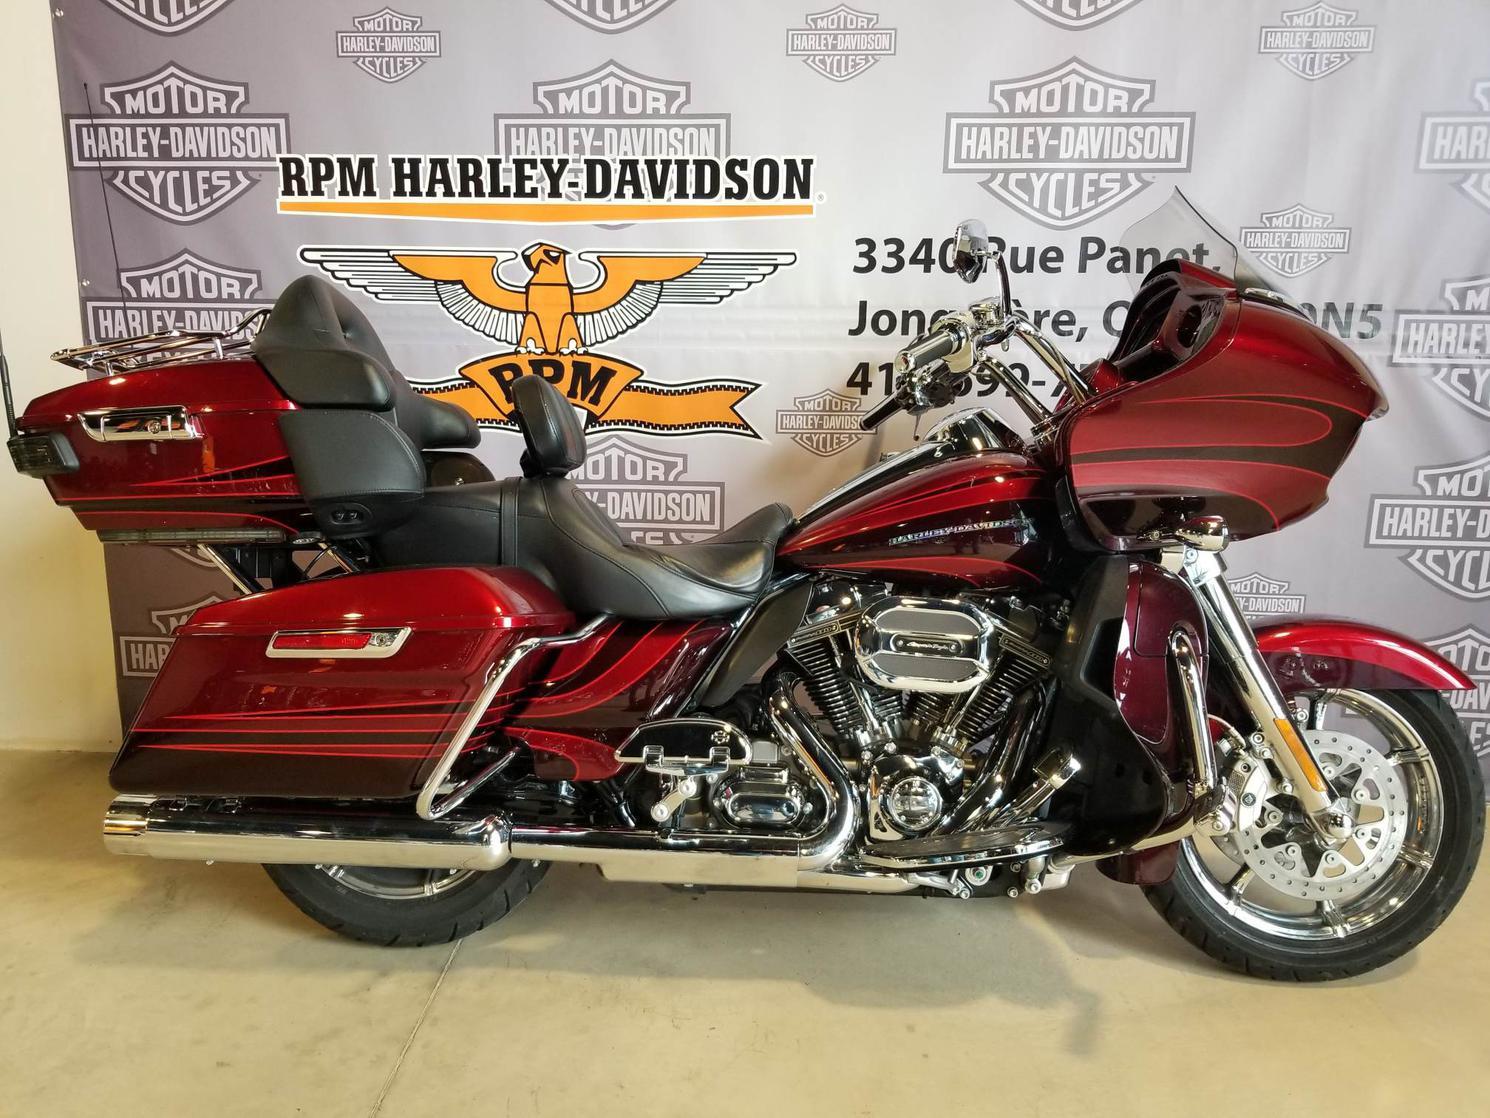 FB959196 Harley-Davidson CVO Road Glide Limited 2015